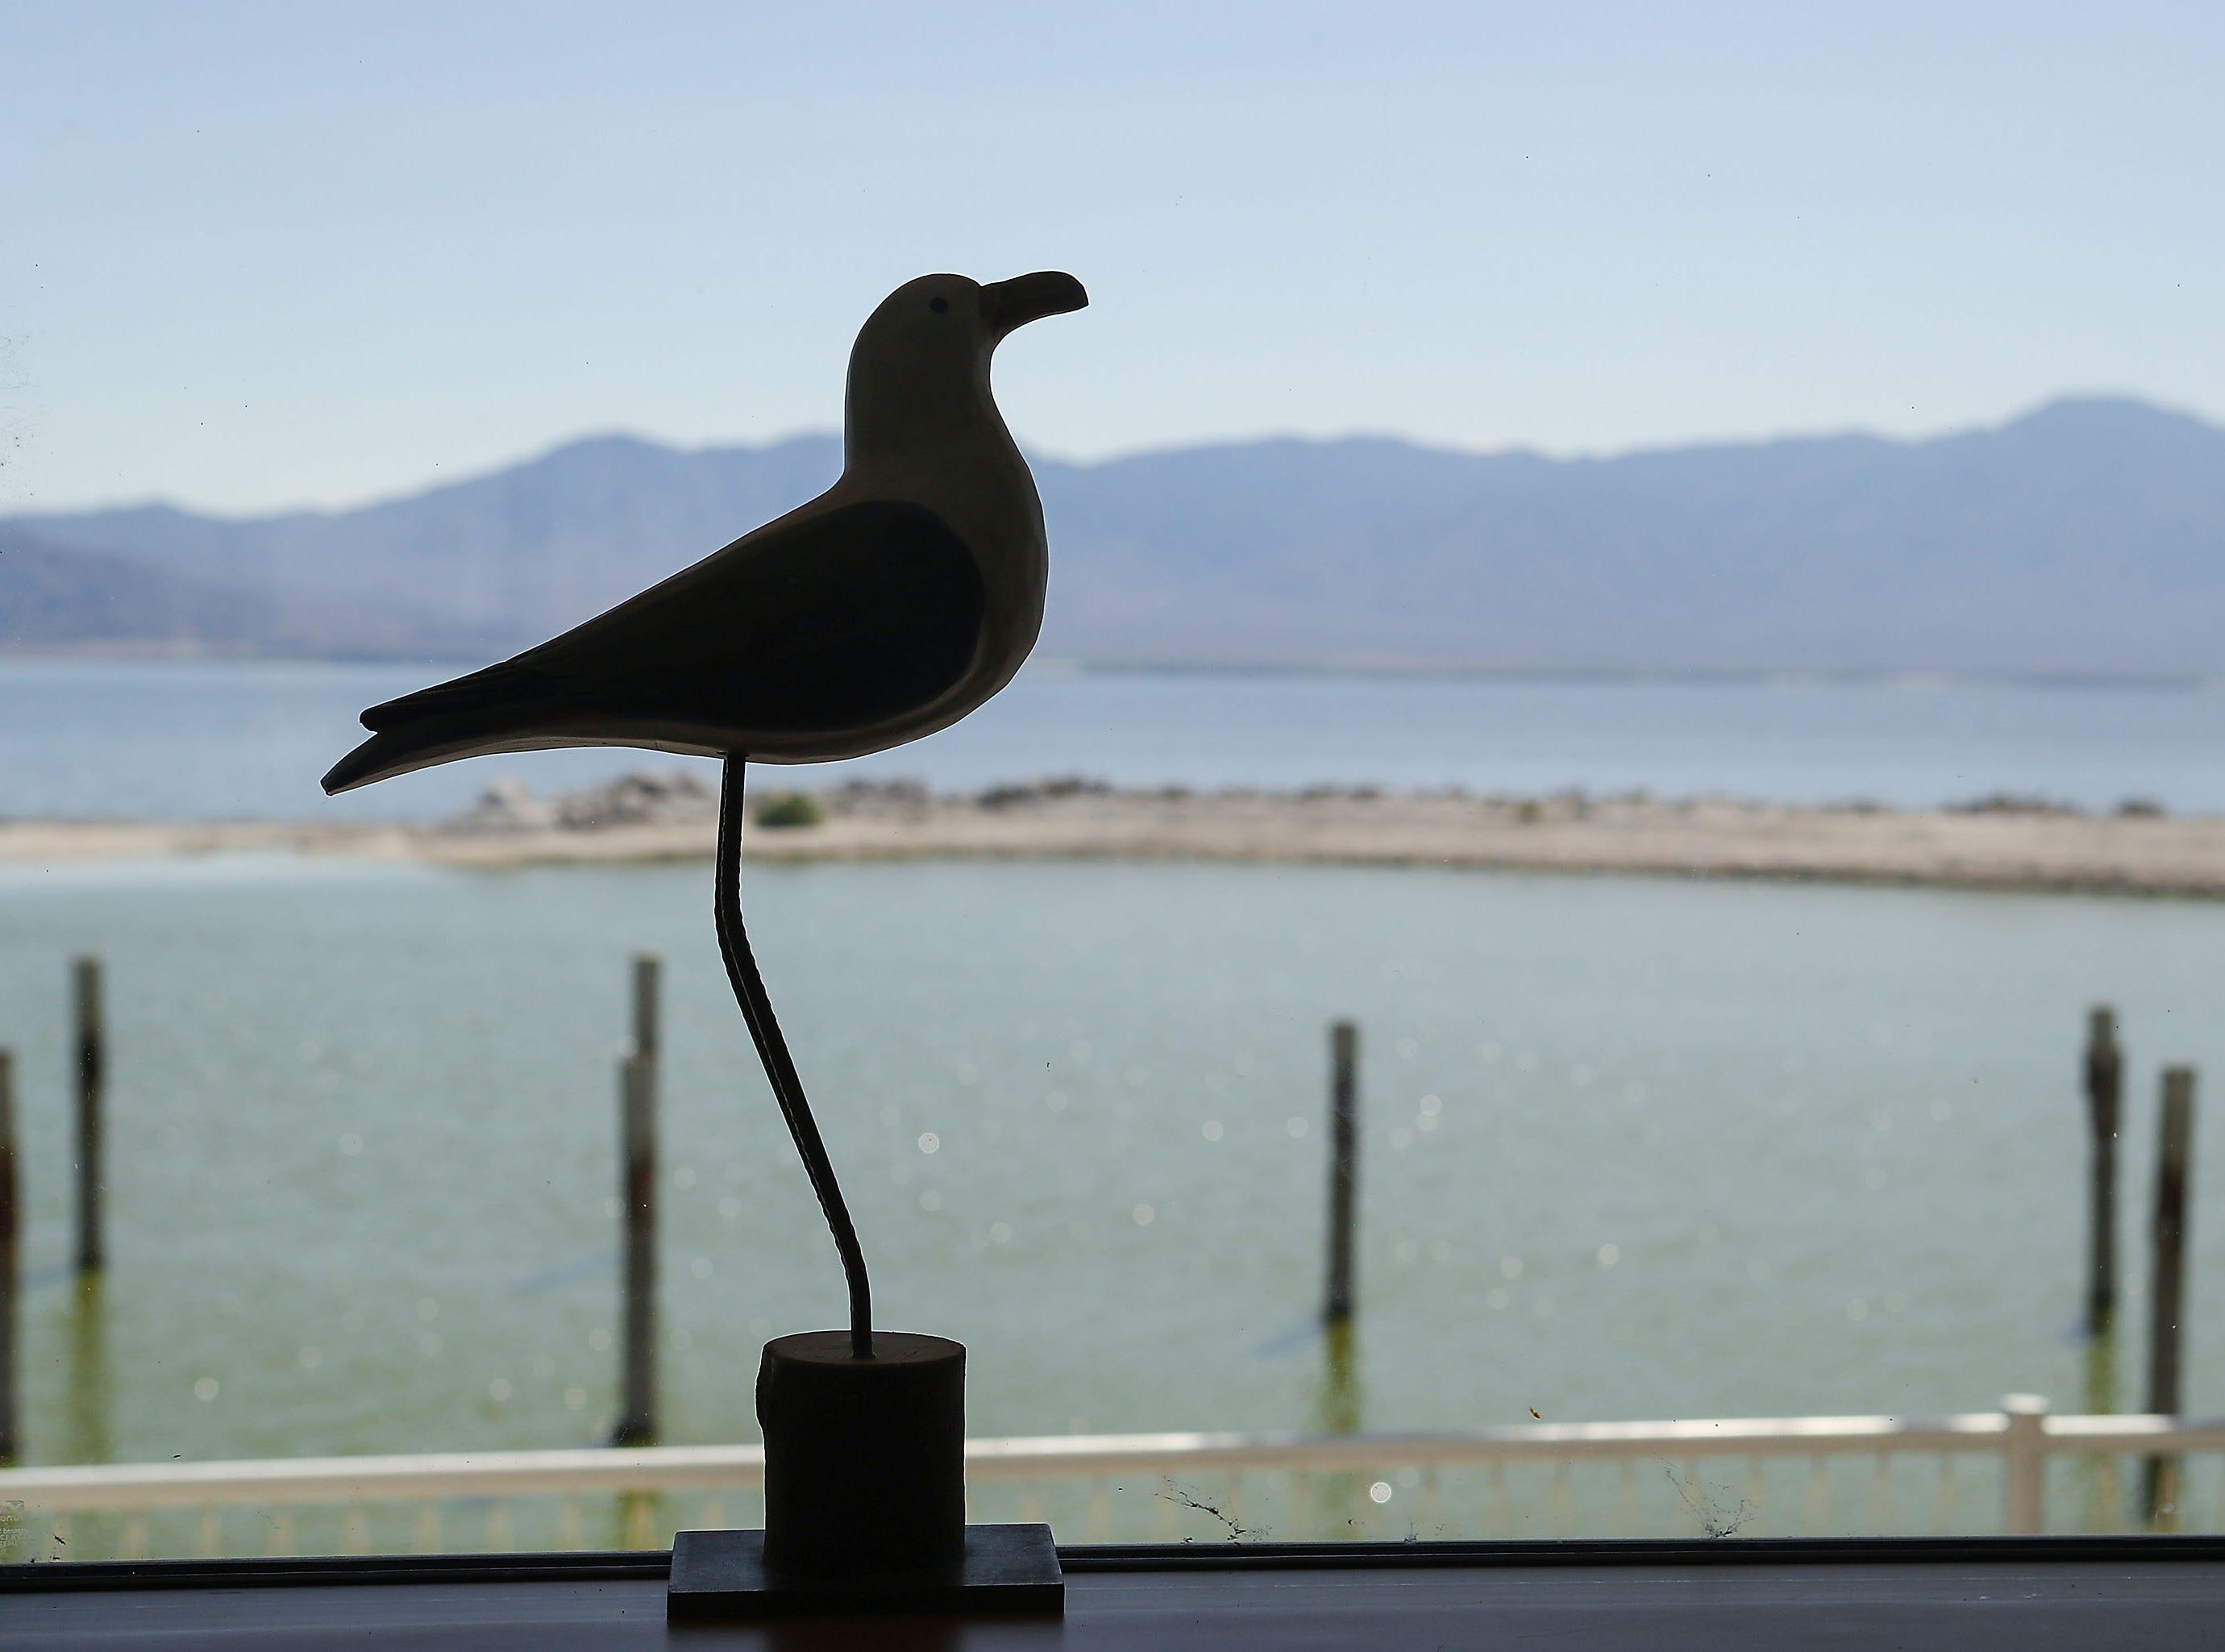 A bird sculpture at the North Shore Yacht Club at the Salton Sea, April 30, 2019.